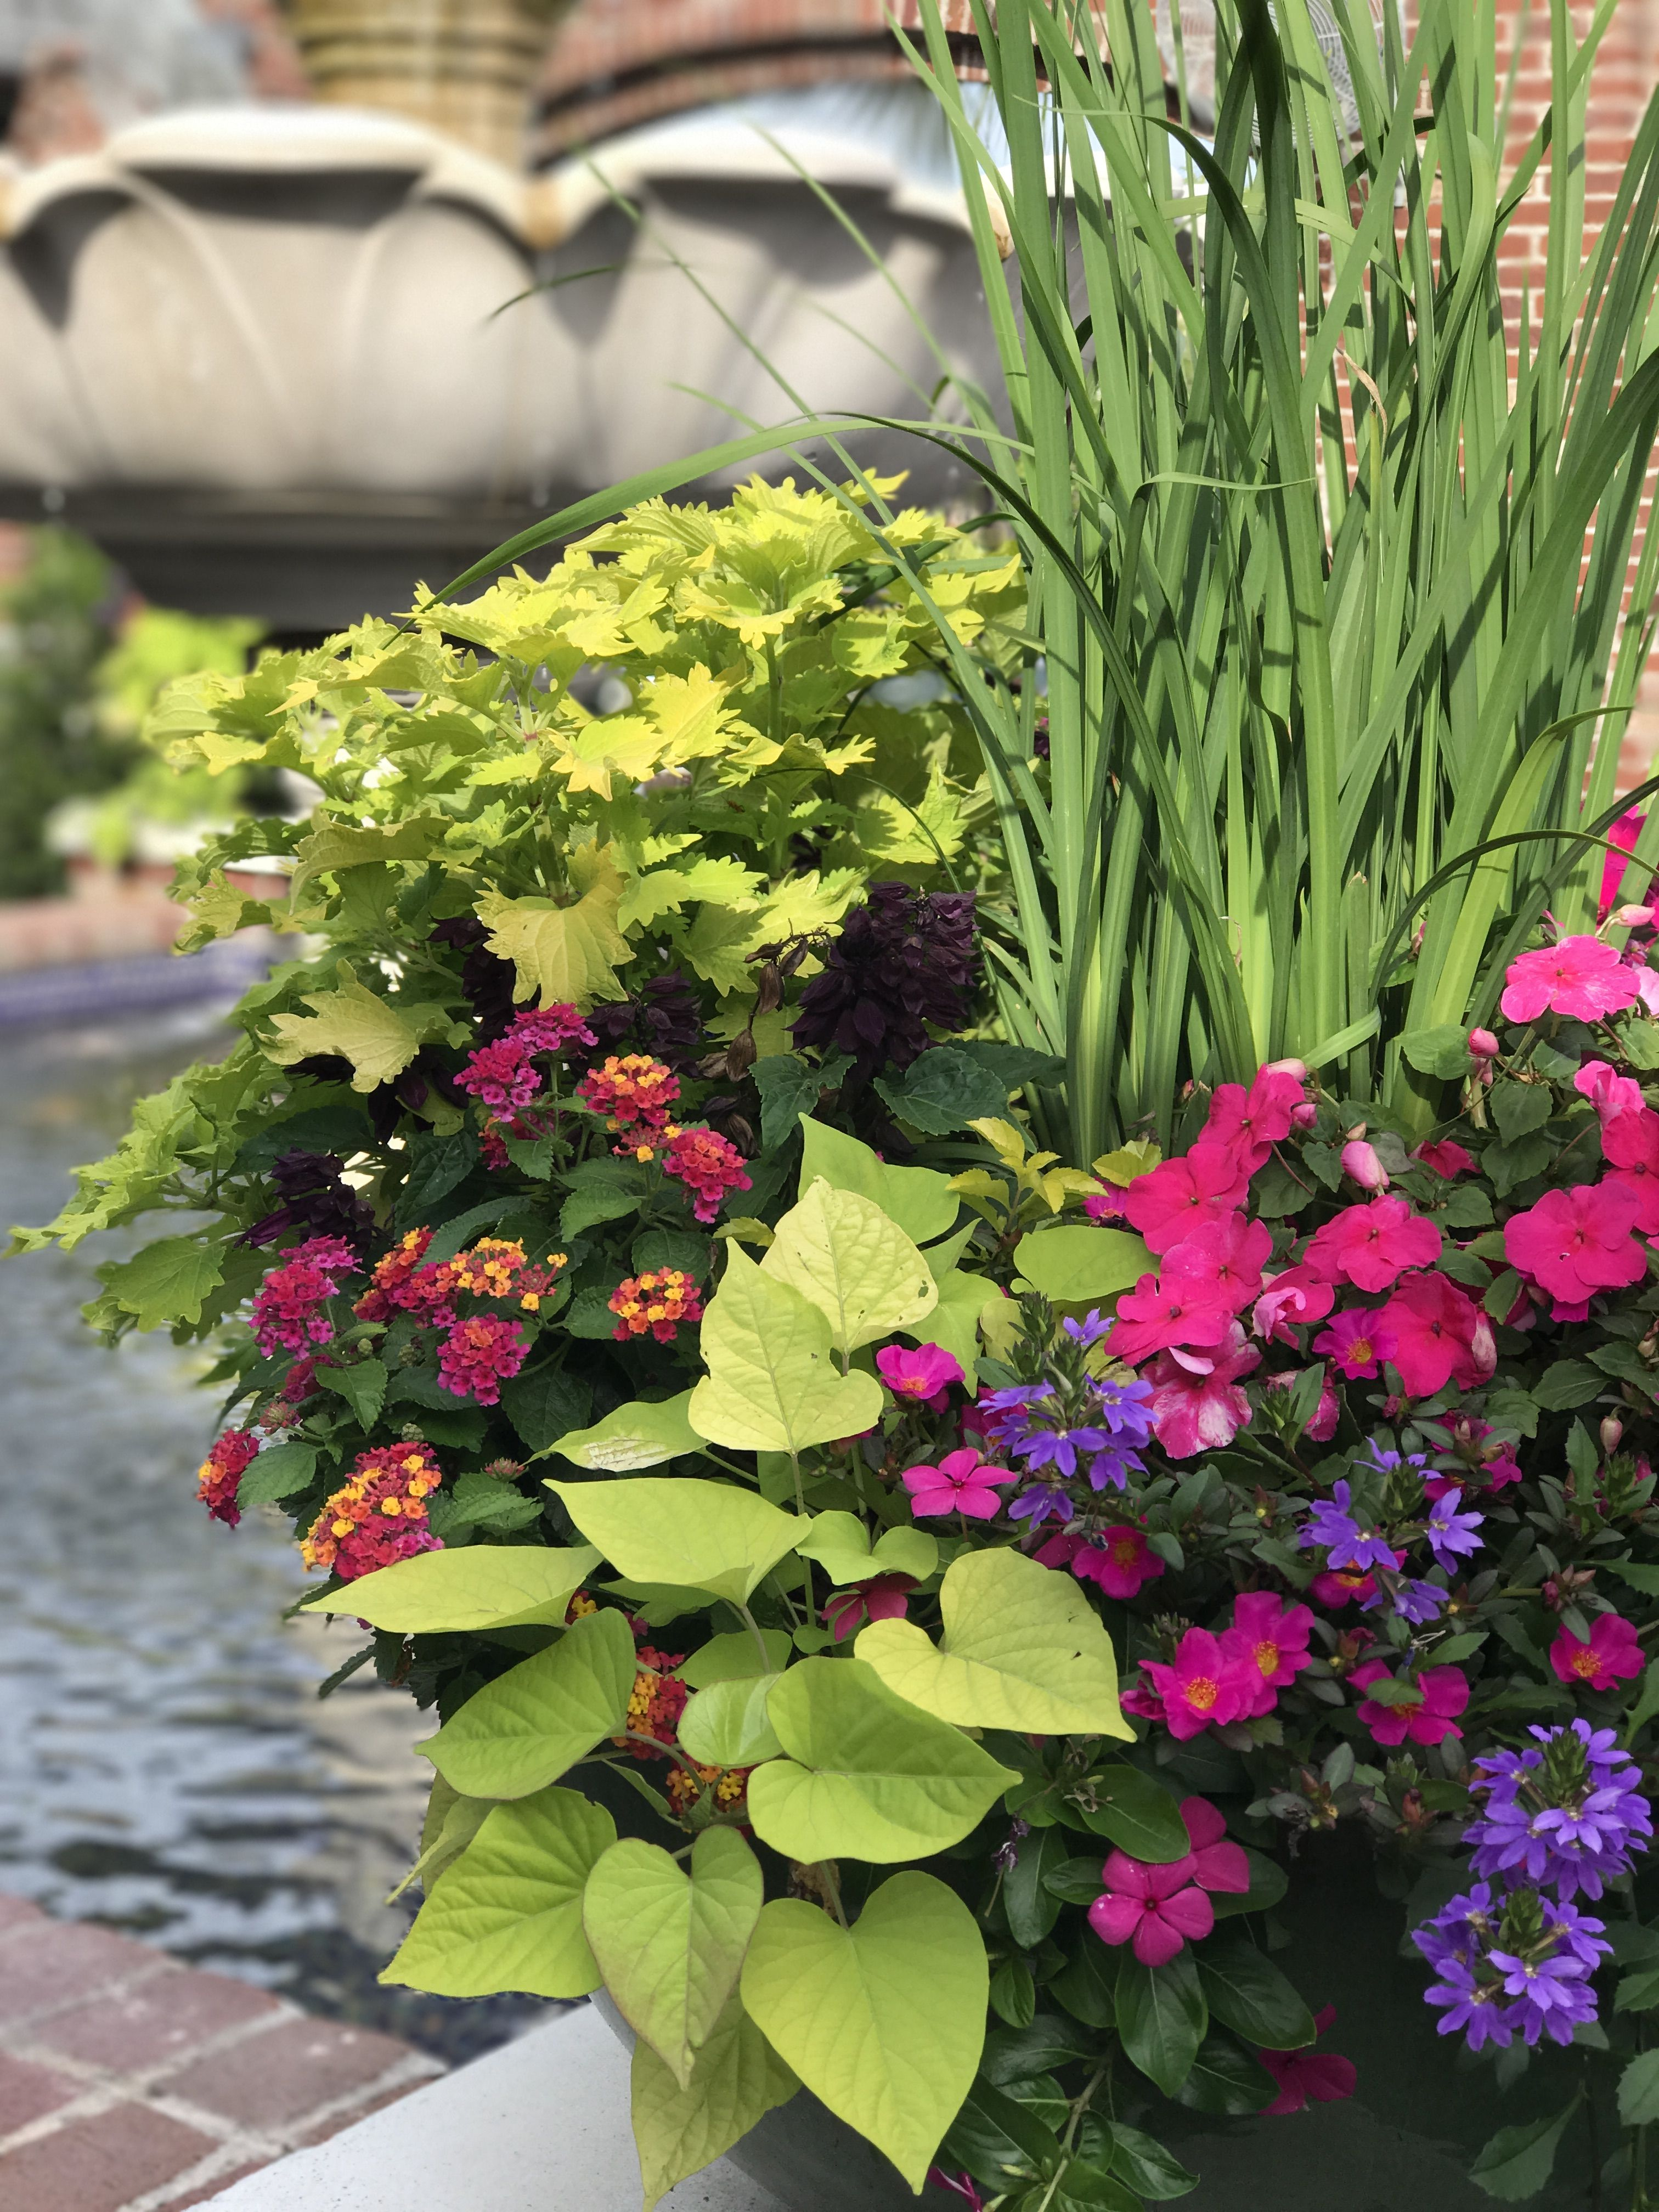 Container Garden, Gardening, Garden, Yard Landscaping, Urban Homesteading, Horticulture